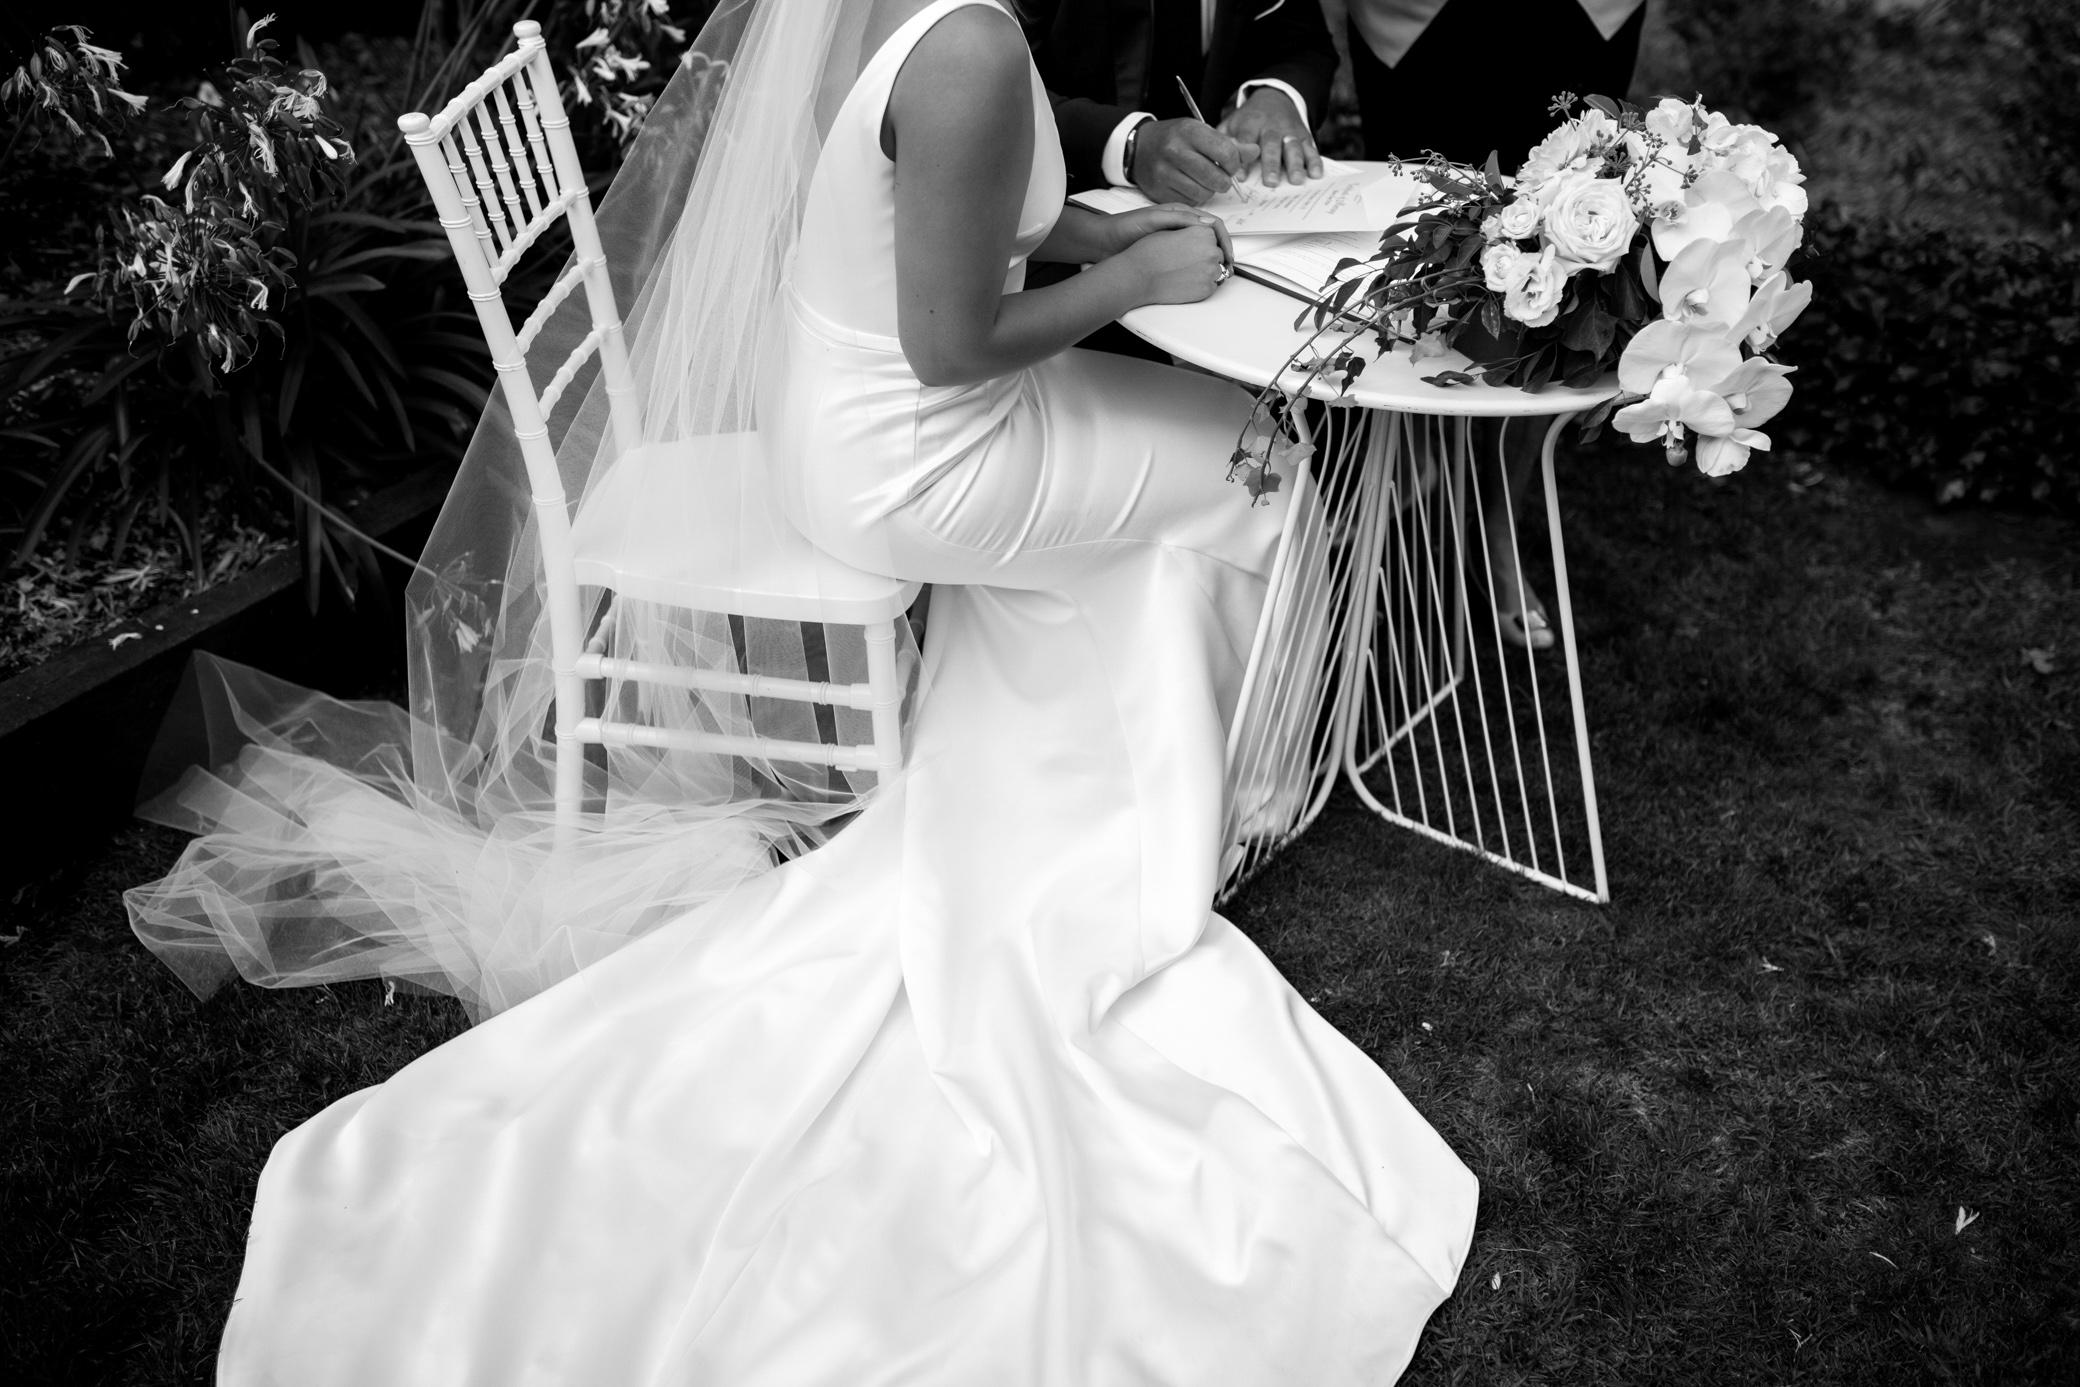 mr-theodore_white-vine-photography_same-sex-wedding-directory5.jpg